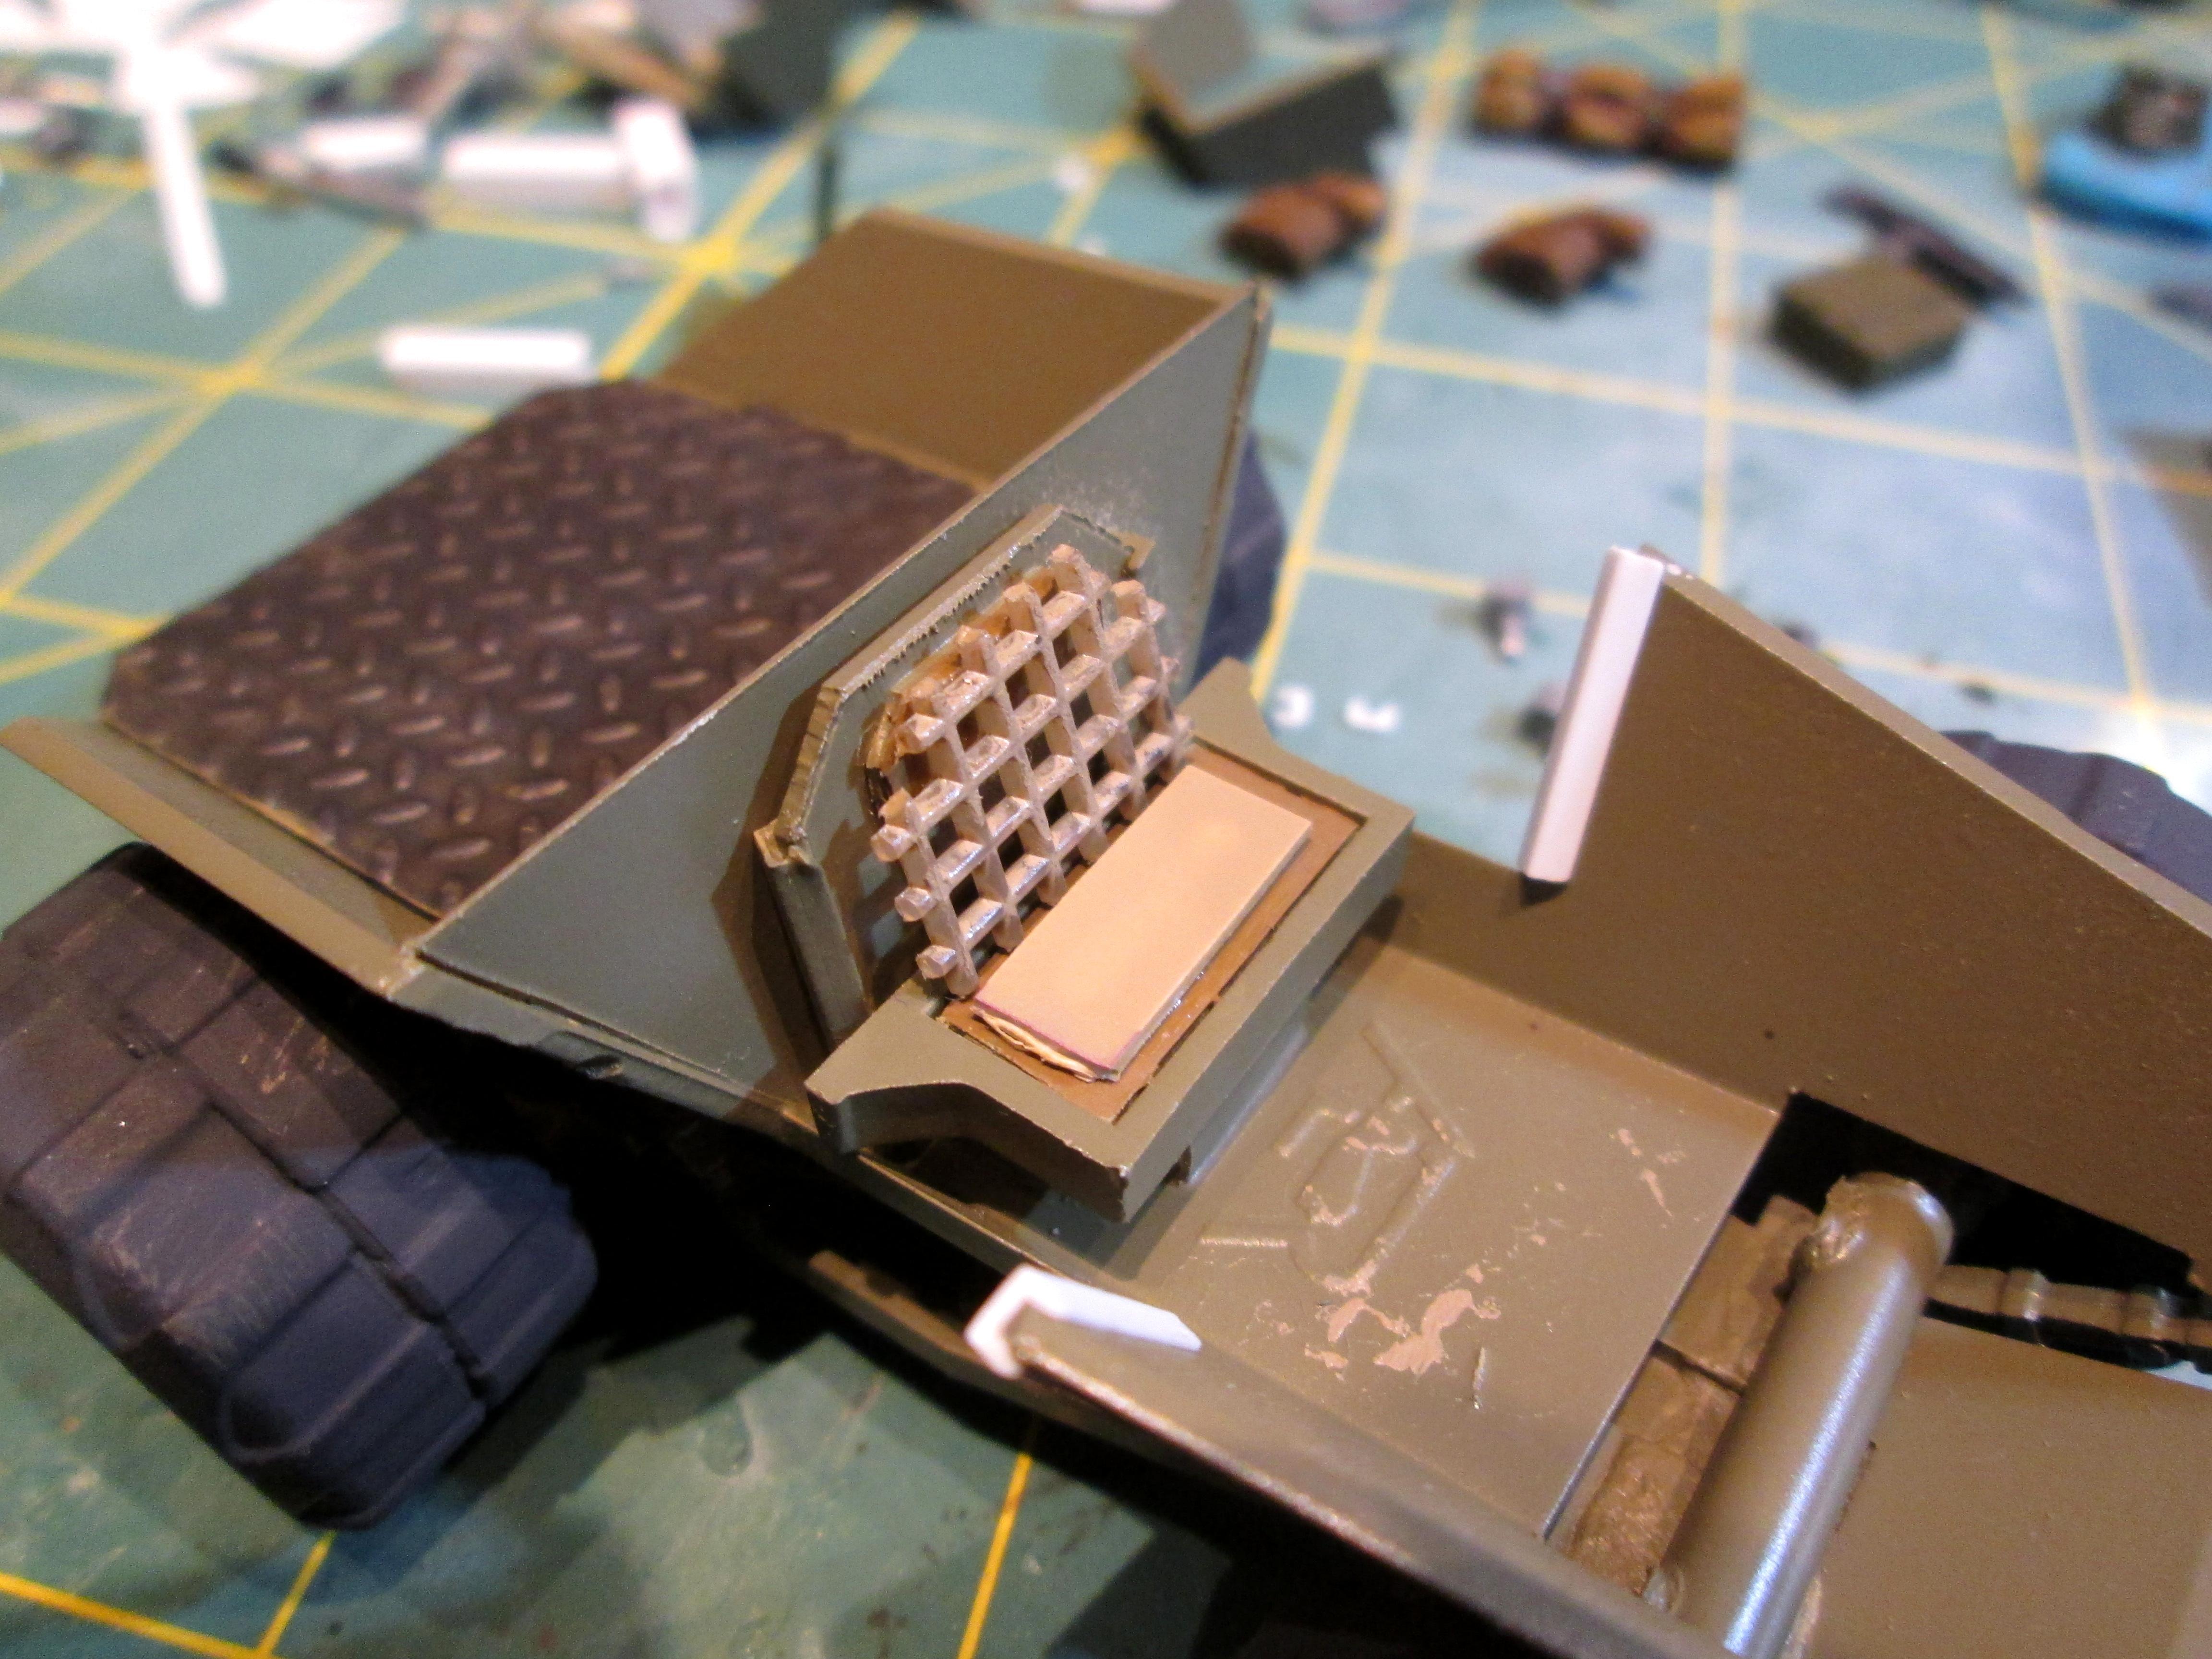 Ba-64, Conversion, Imperial Guard, Salamandar, Scout Car